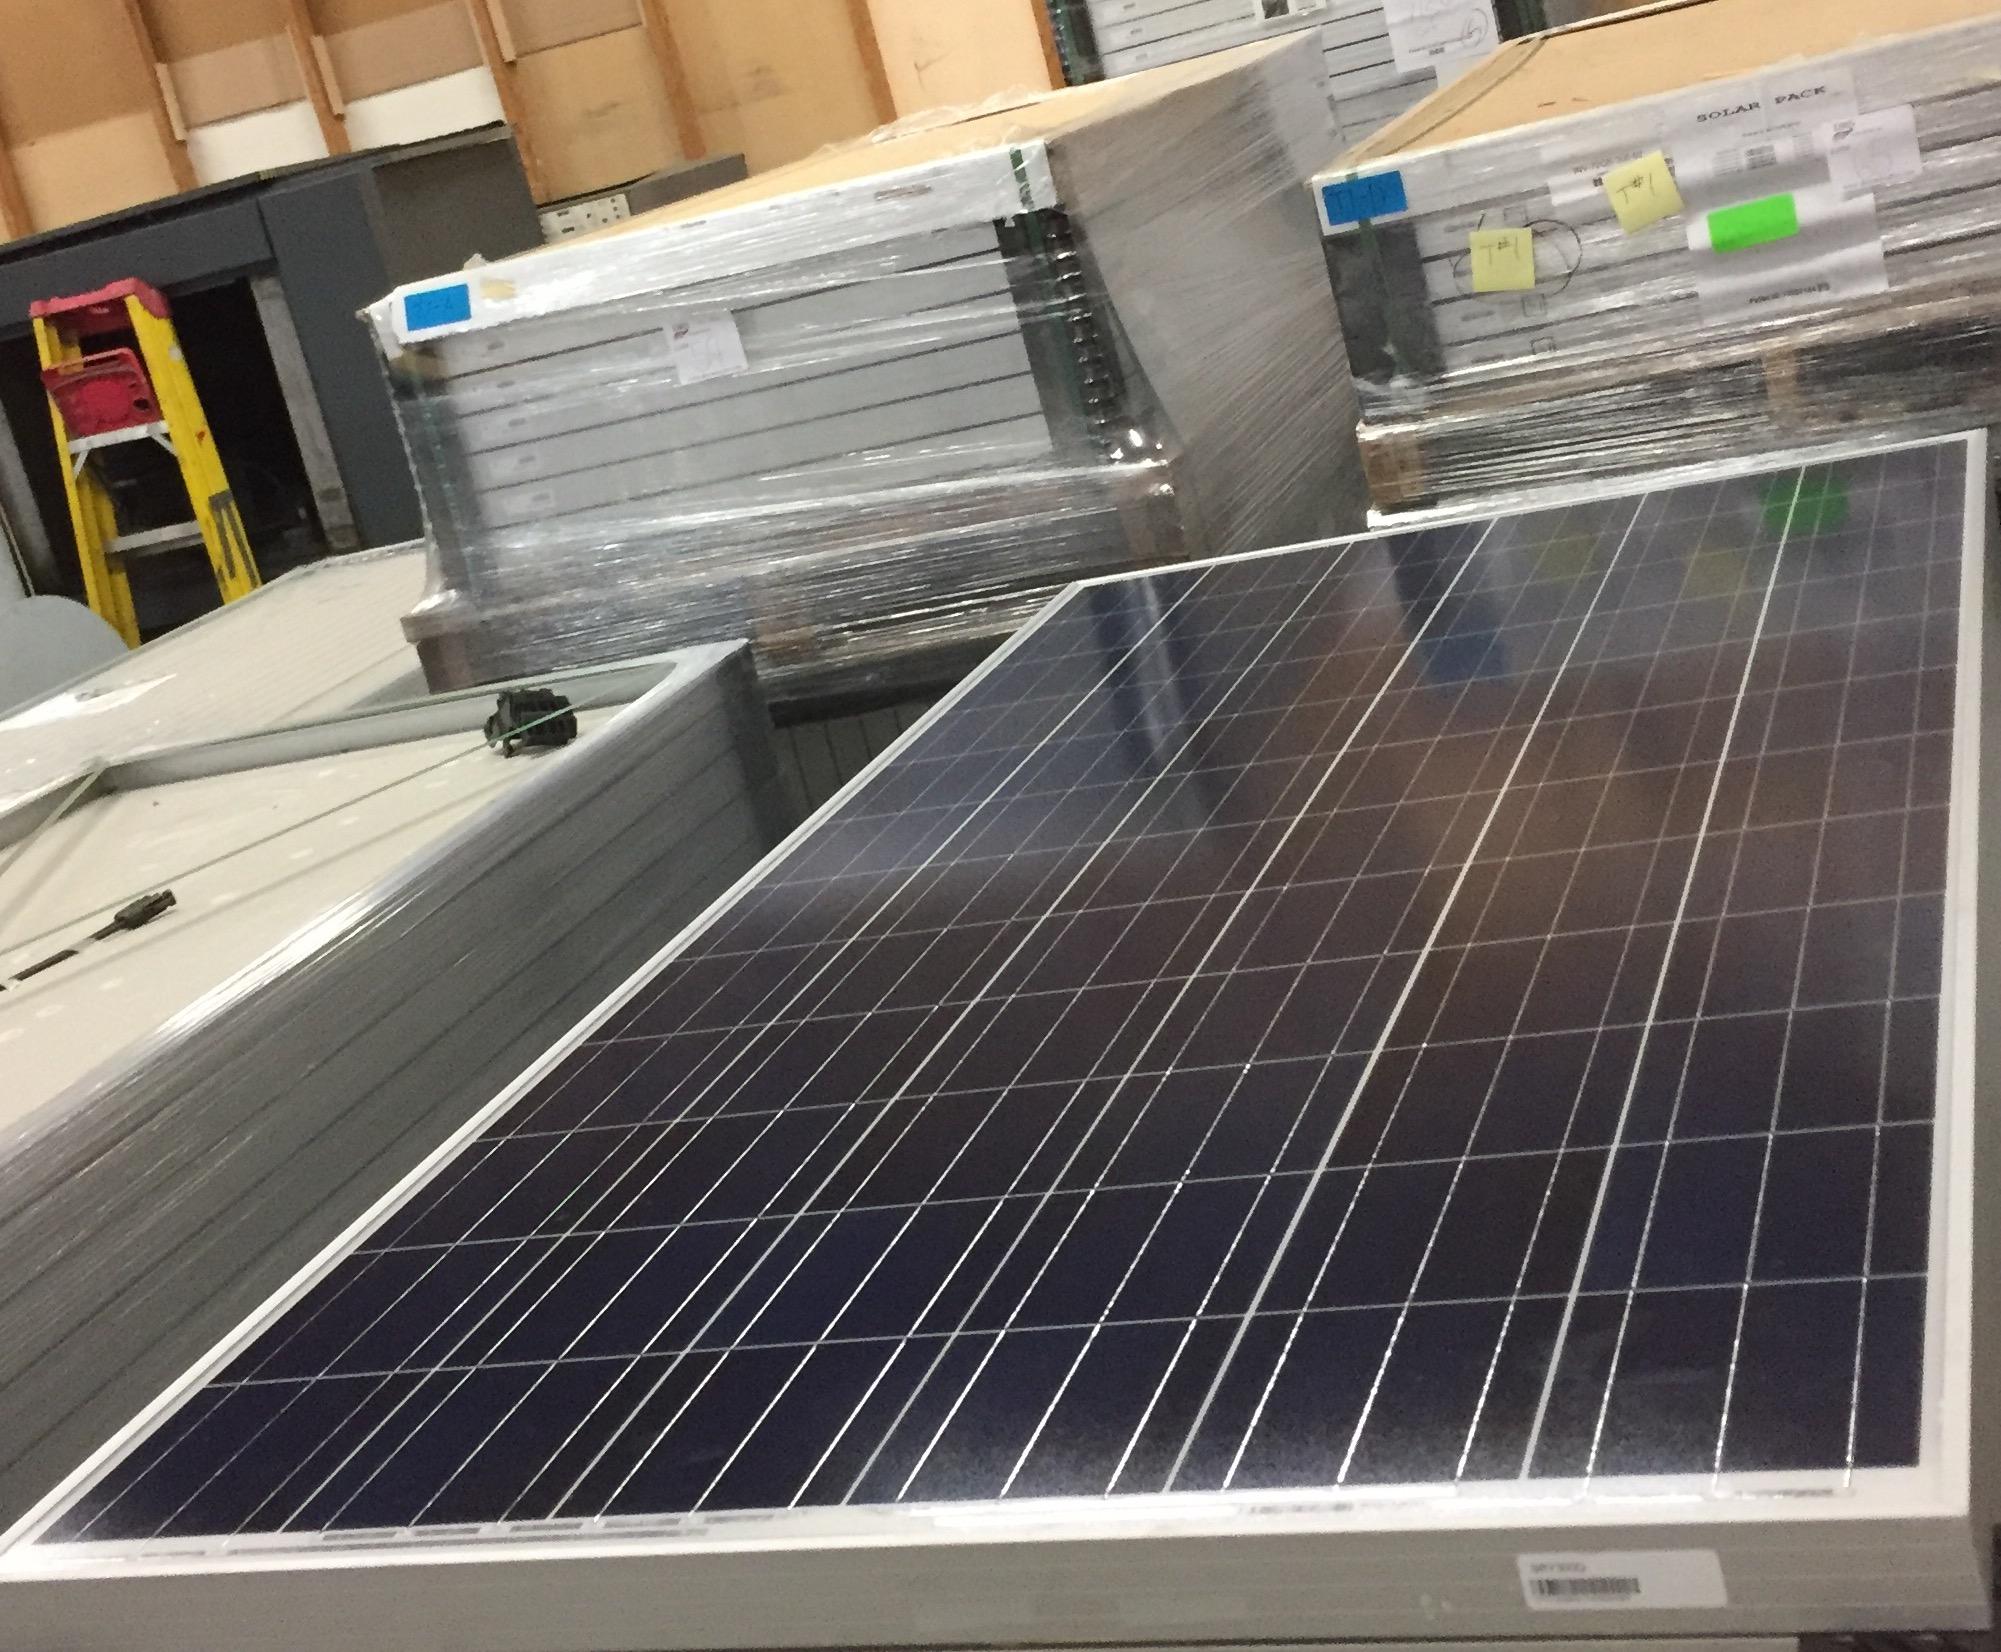 Lot 34 - LOT OF (5) 300 WATT SOLAR PANELS - (BIDDING IS PER PANEL MULTIPLIED BY 5)